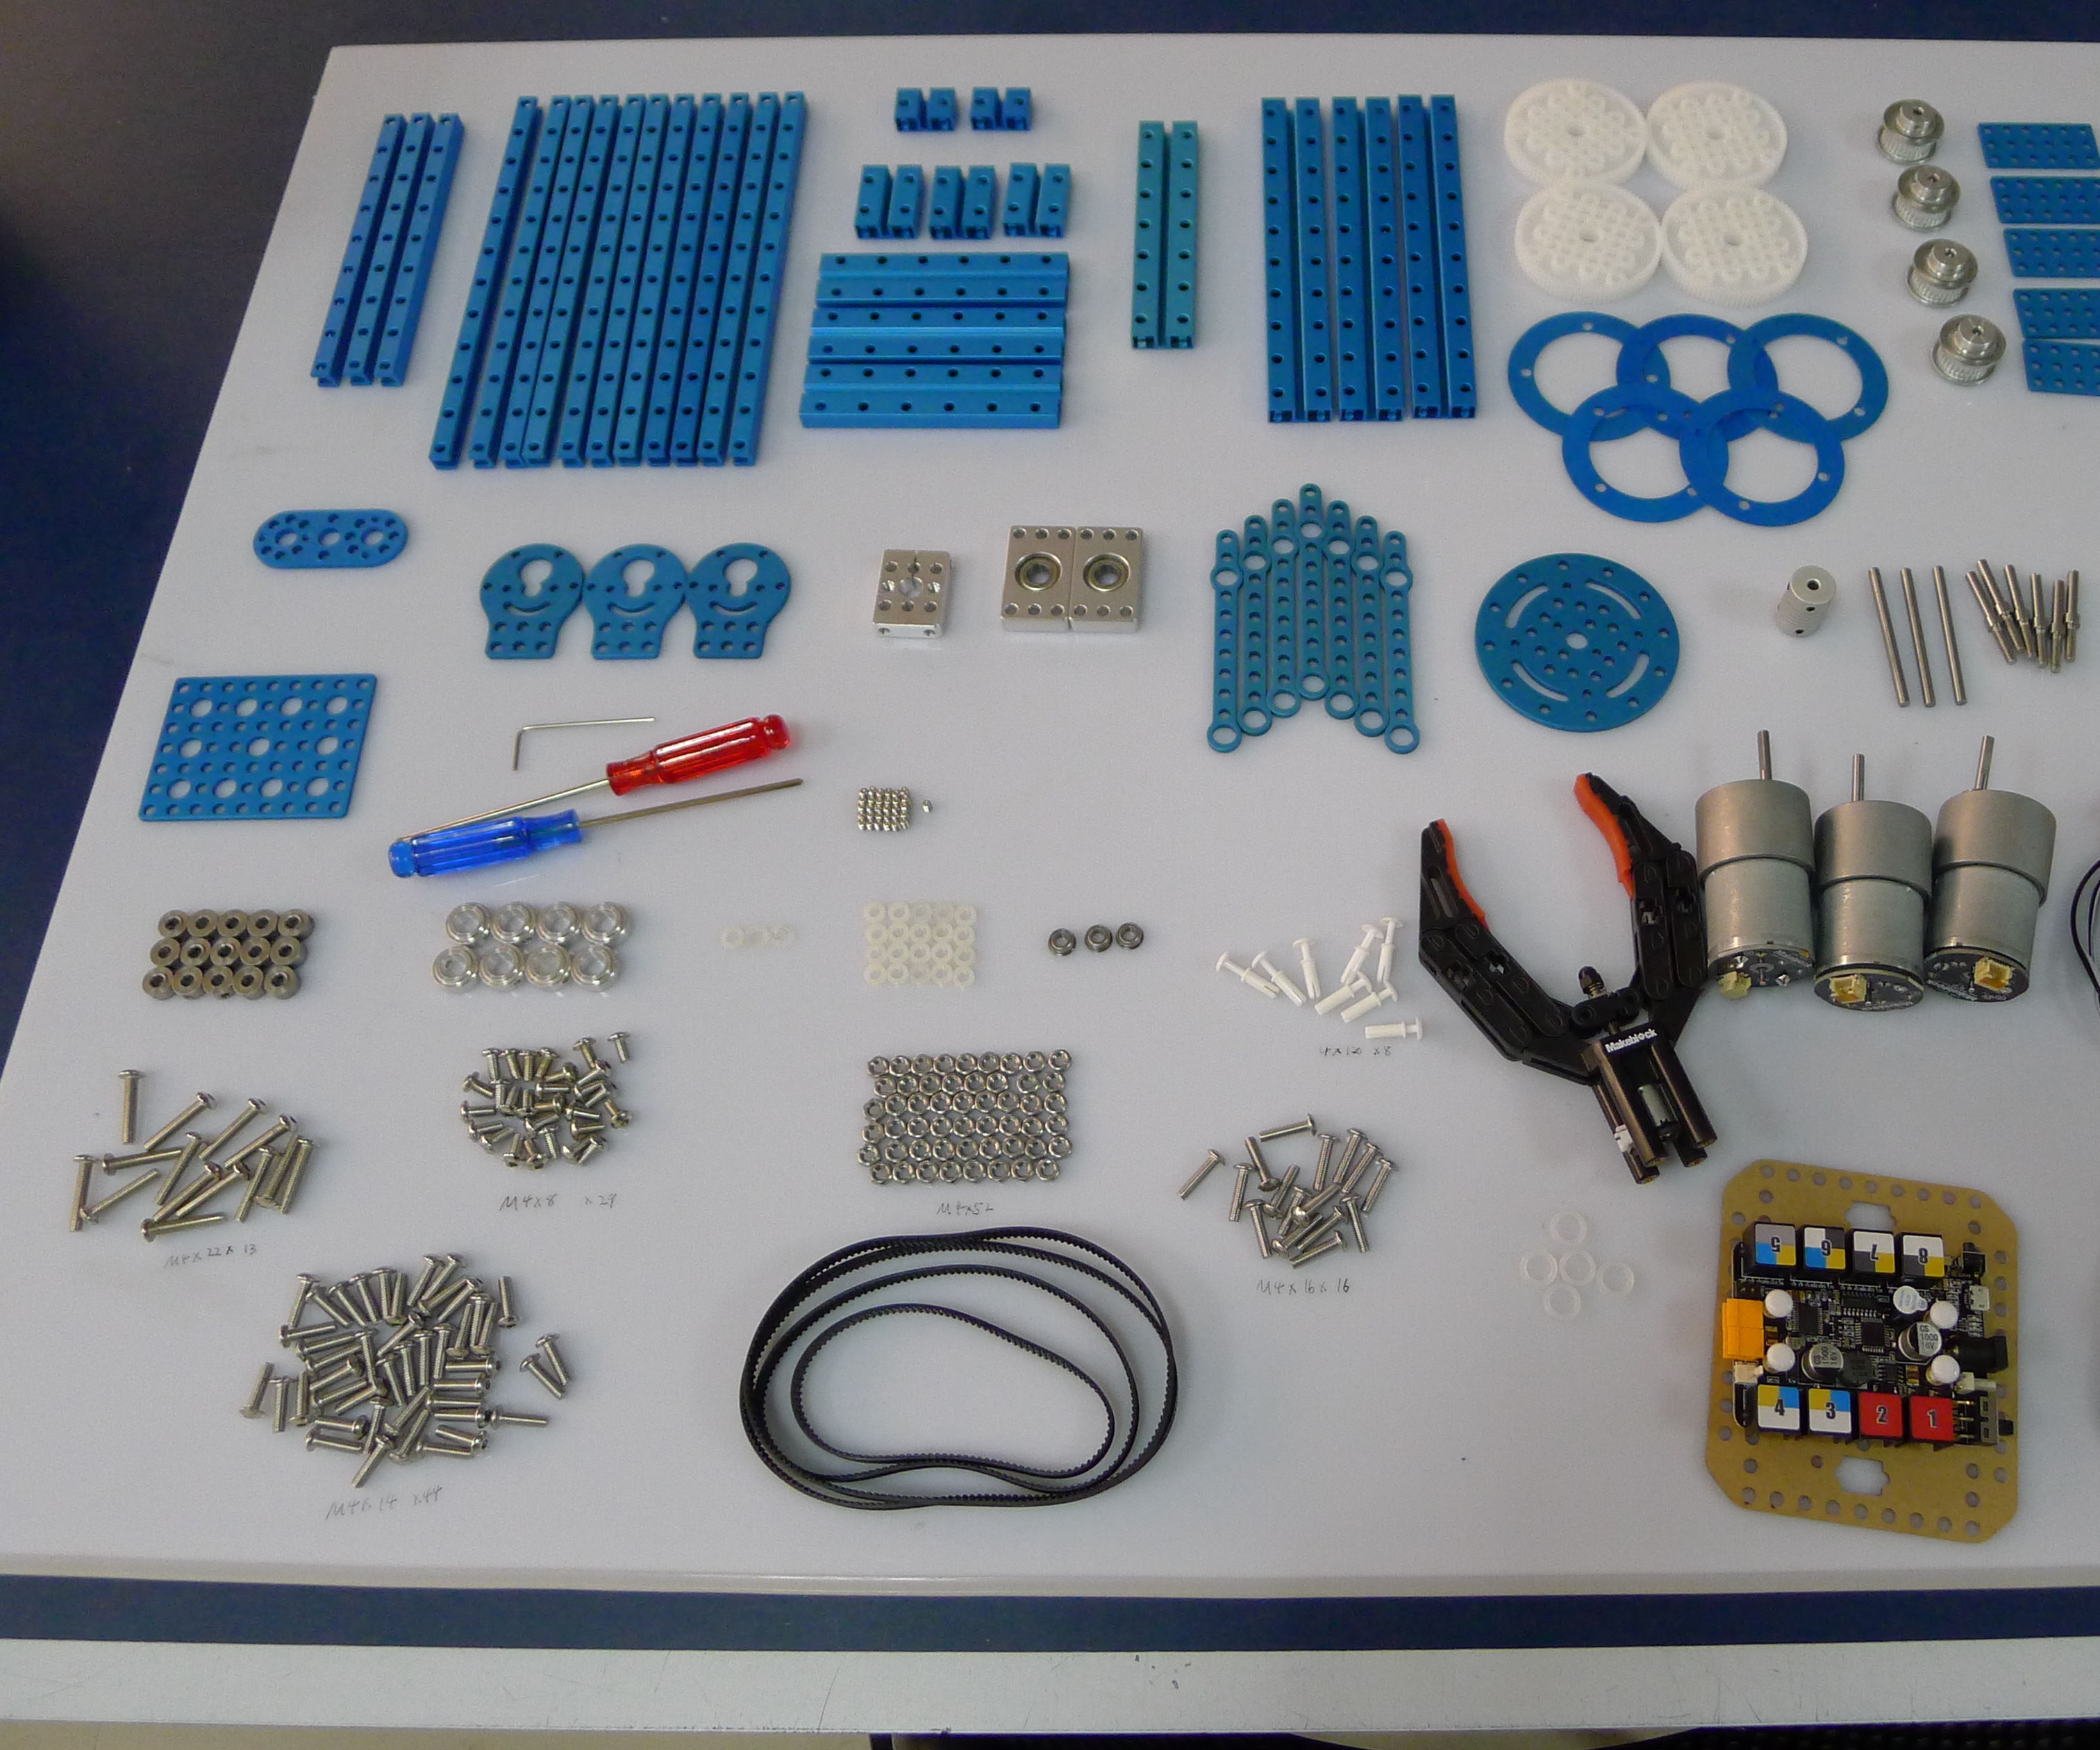 Building Robotic Arm With Makeblock Parts